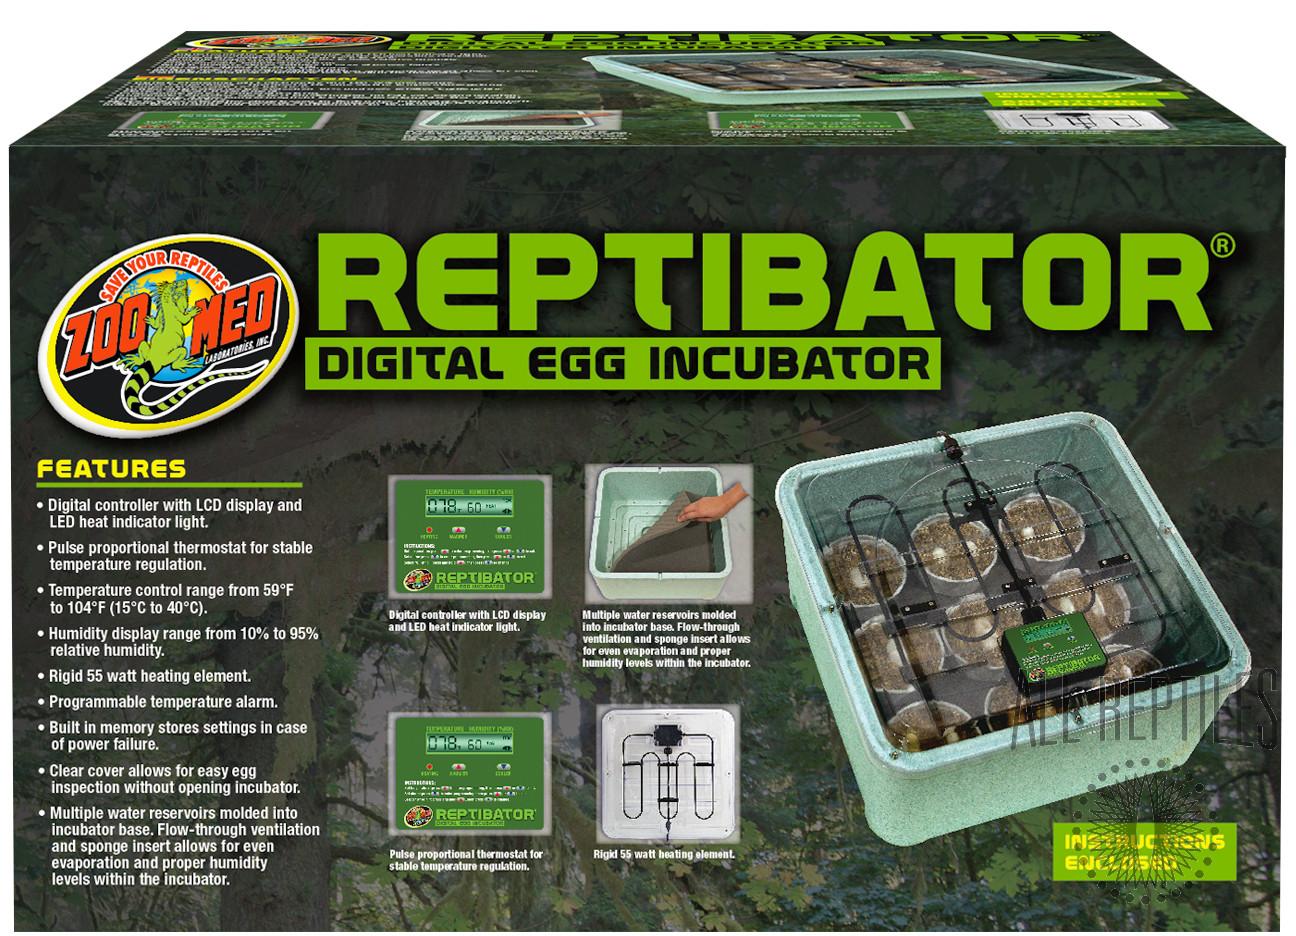 ZM Reptibator Egg Incubator